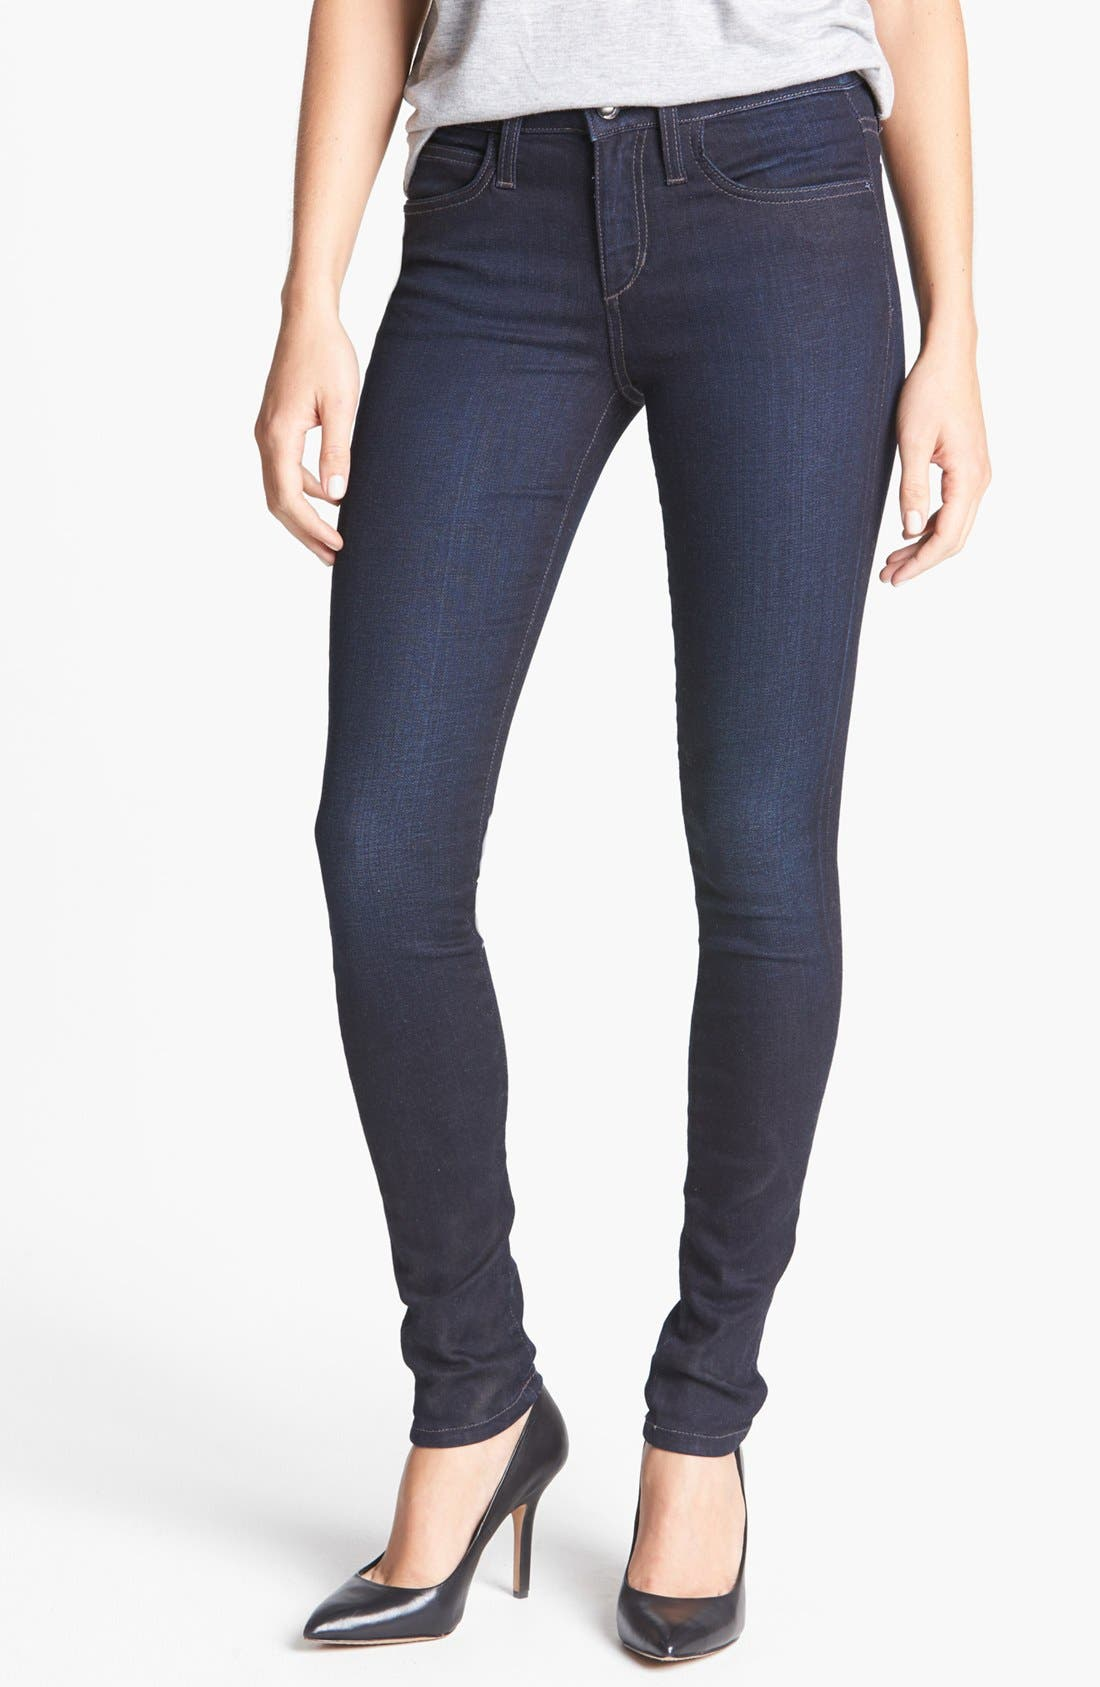 Alternate Image 1 Selected - Joe's 'The Skinny' Stretch Skinny Jeans (Auria)